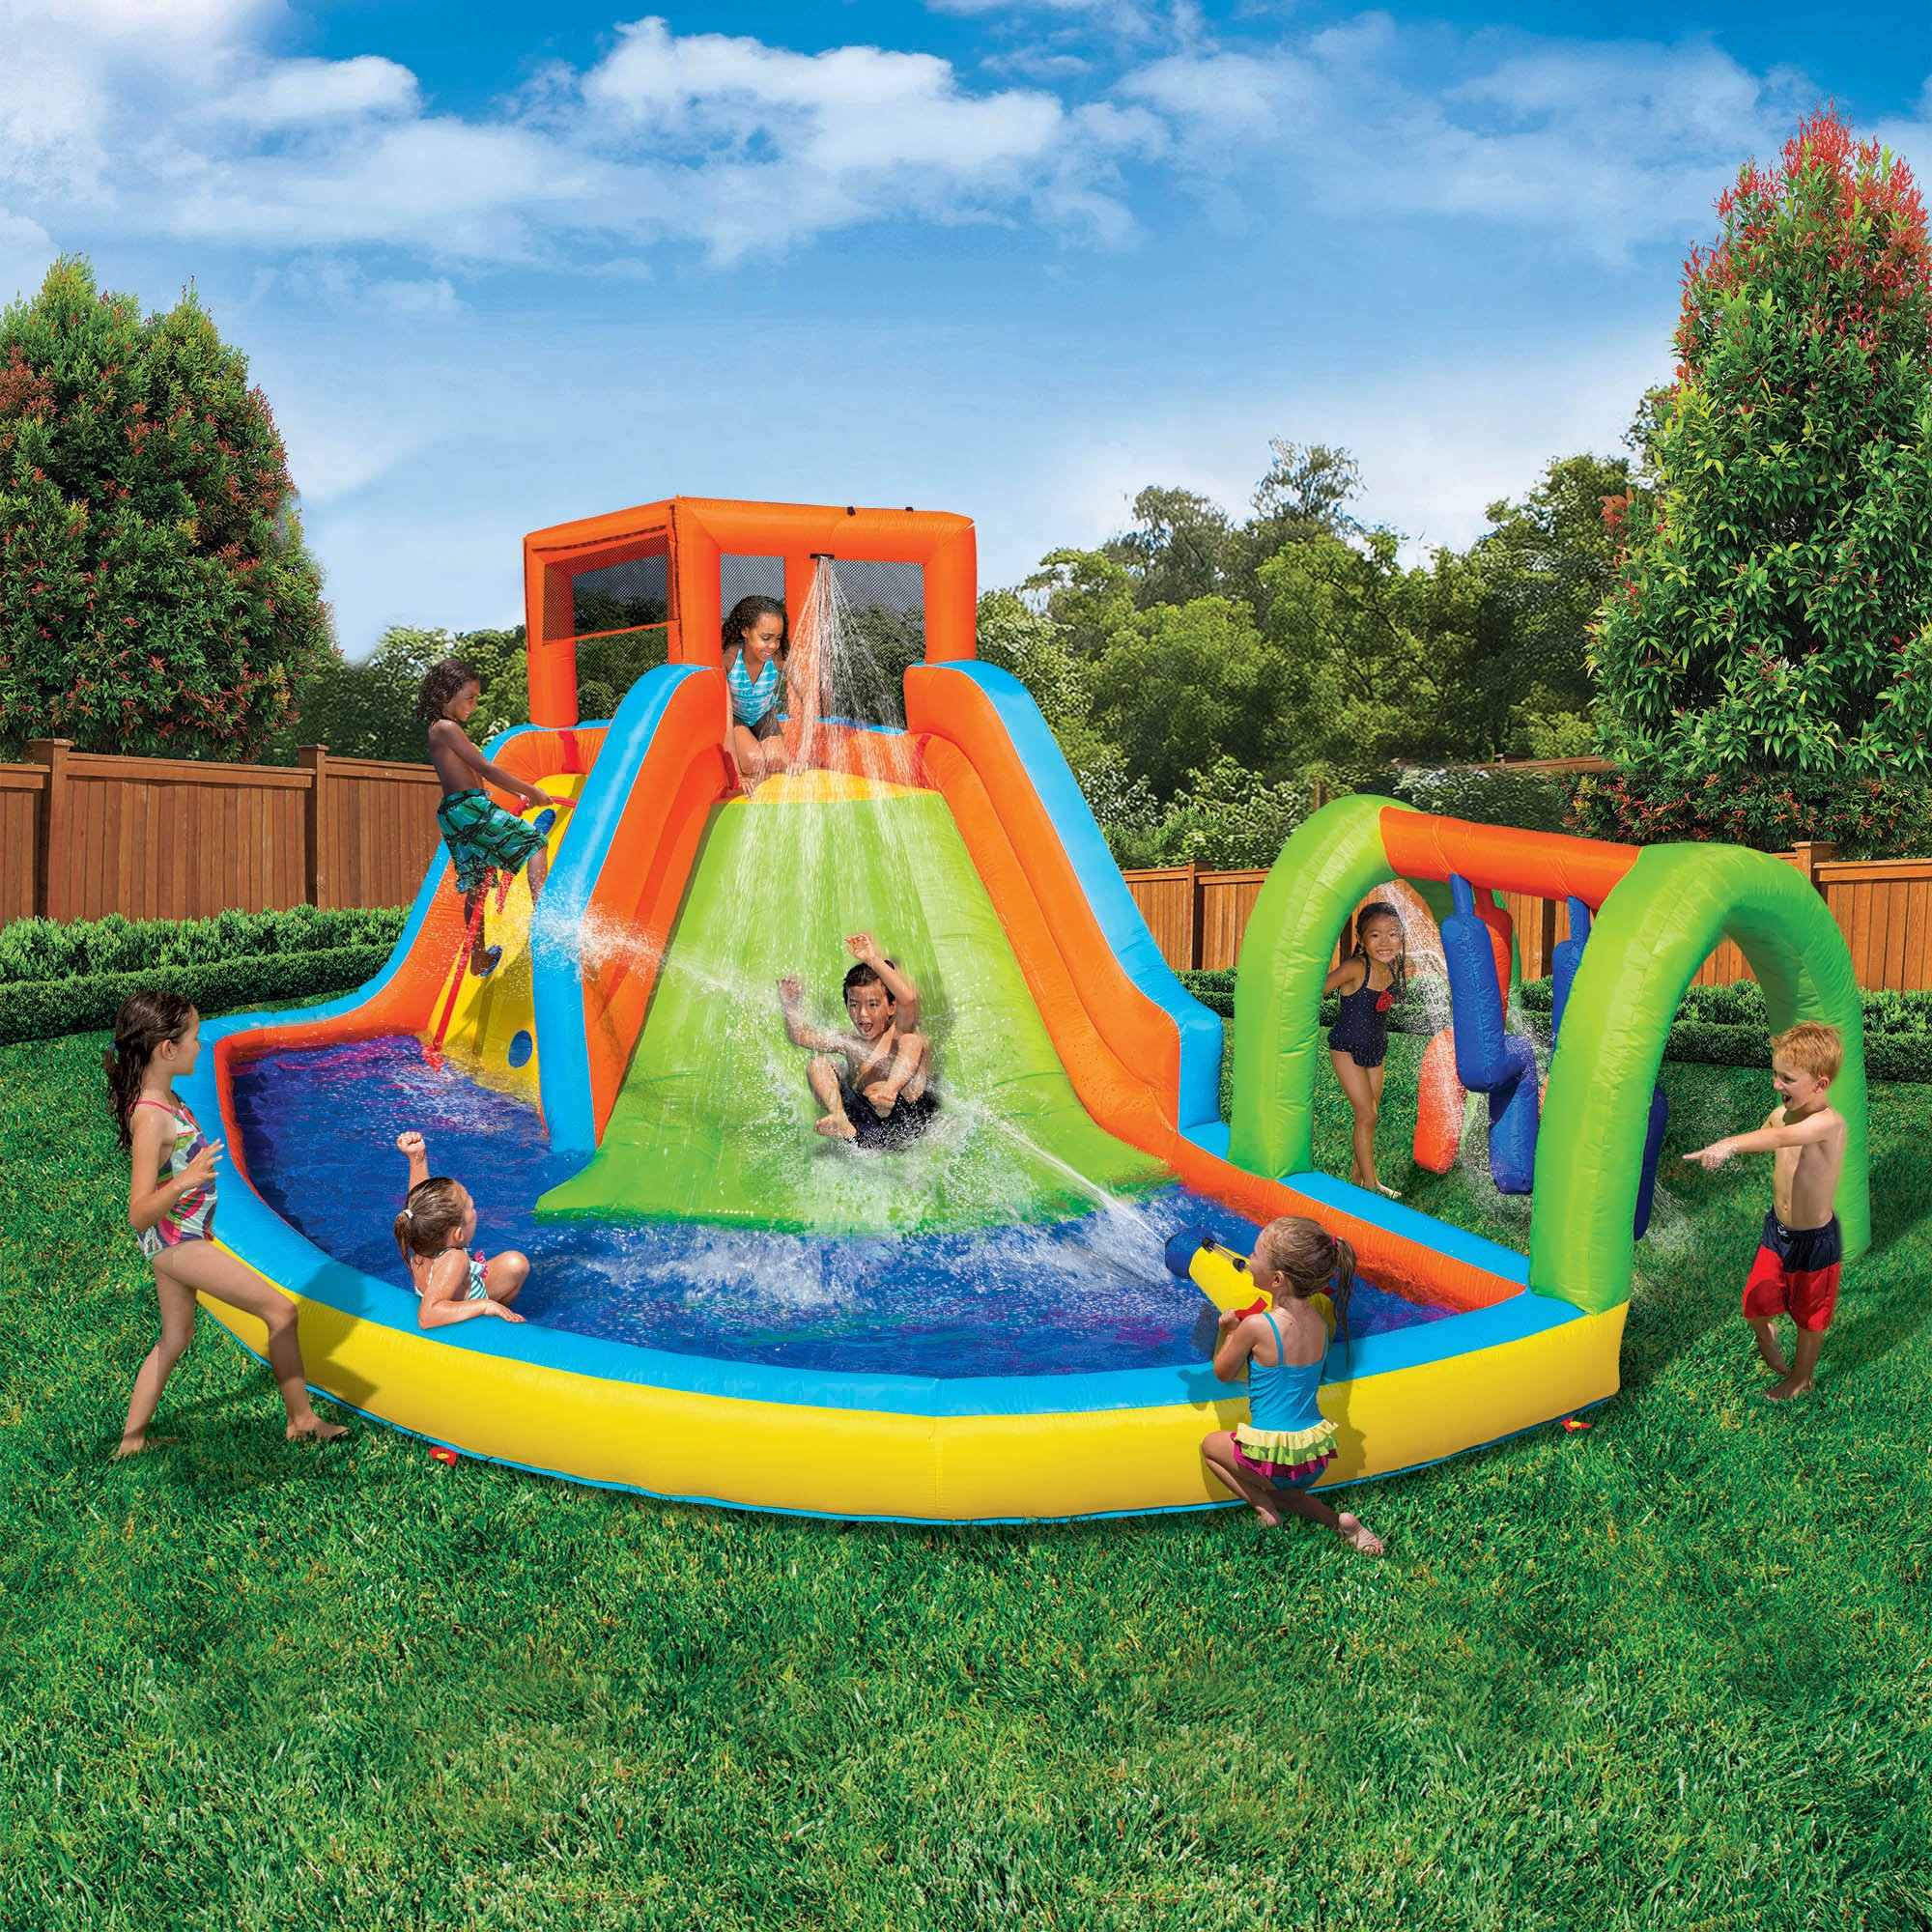 Inflatable Water Slides Llc: Banzai Inflatable Summit Splash Adventure Splash Pool